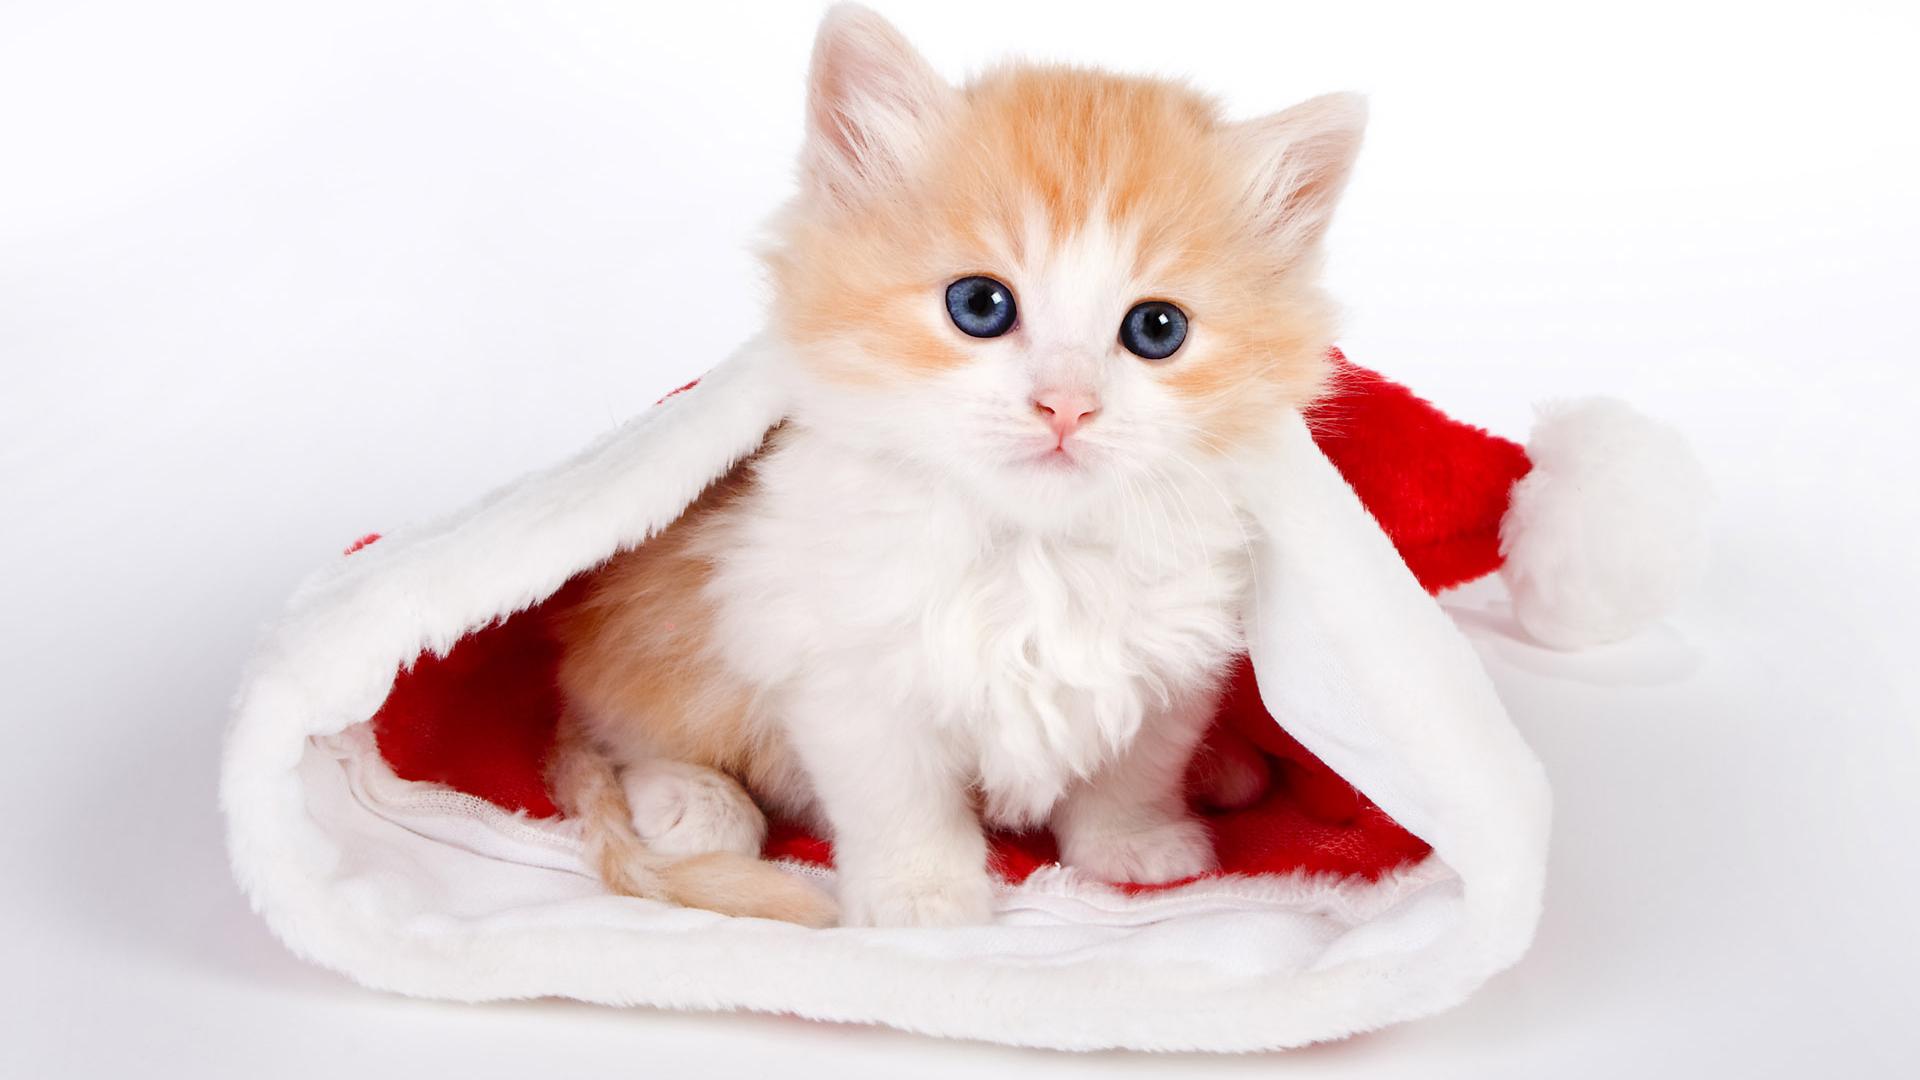 Free Download Cute Cat Wallpapers Cute Cat Desktop Wallpaper Cat Desktop 1920x1200 For Your Desktop Mobile Tablet Explore 72 Cute Laptop Wallpapers Christmas Wallpapers For Desktop Full Screen Wallpaper